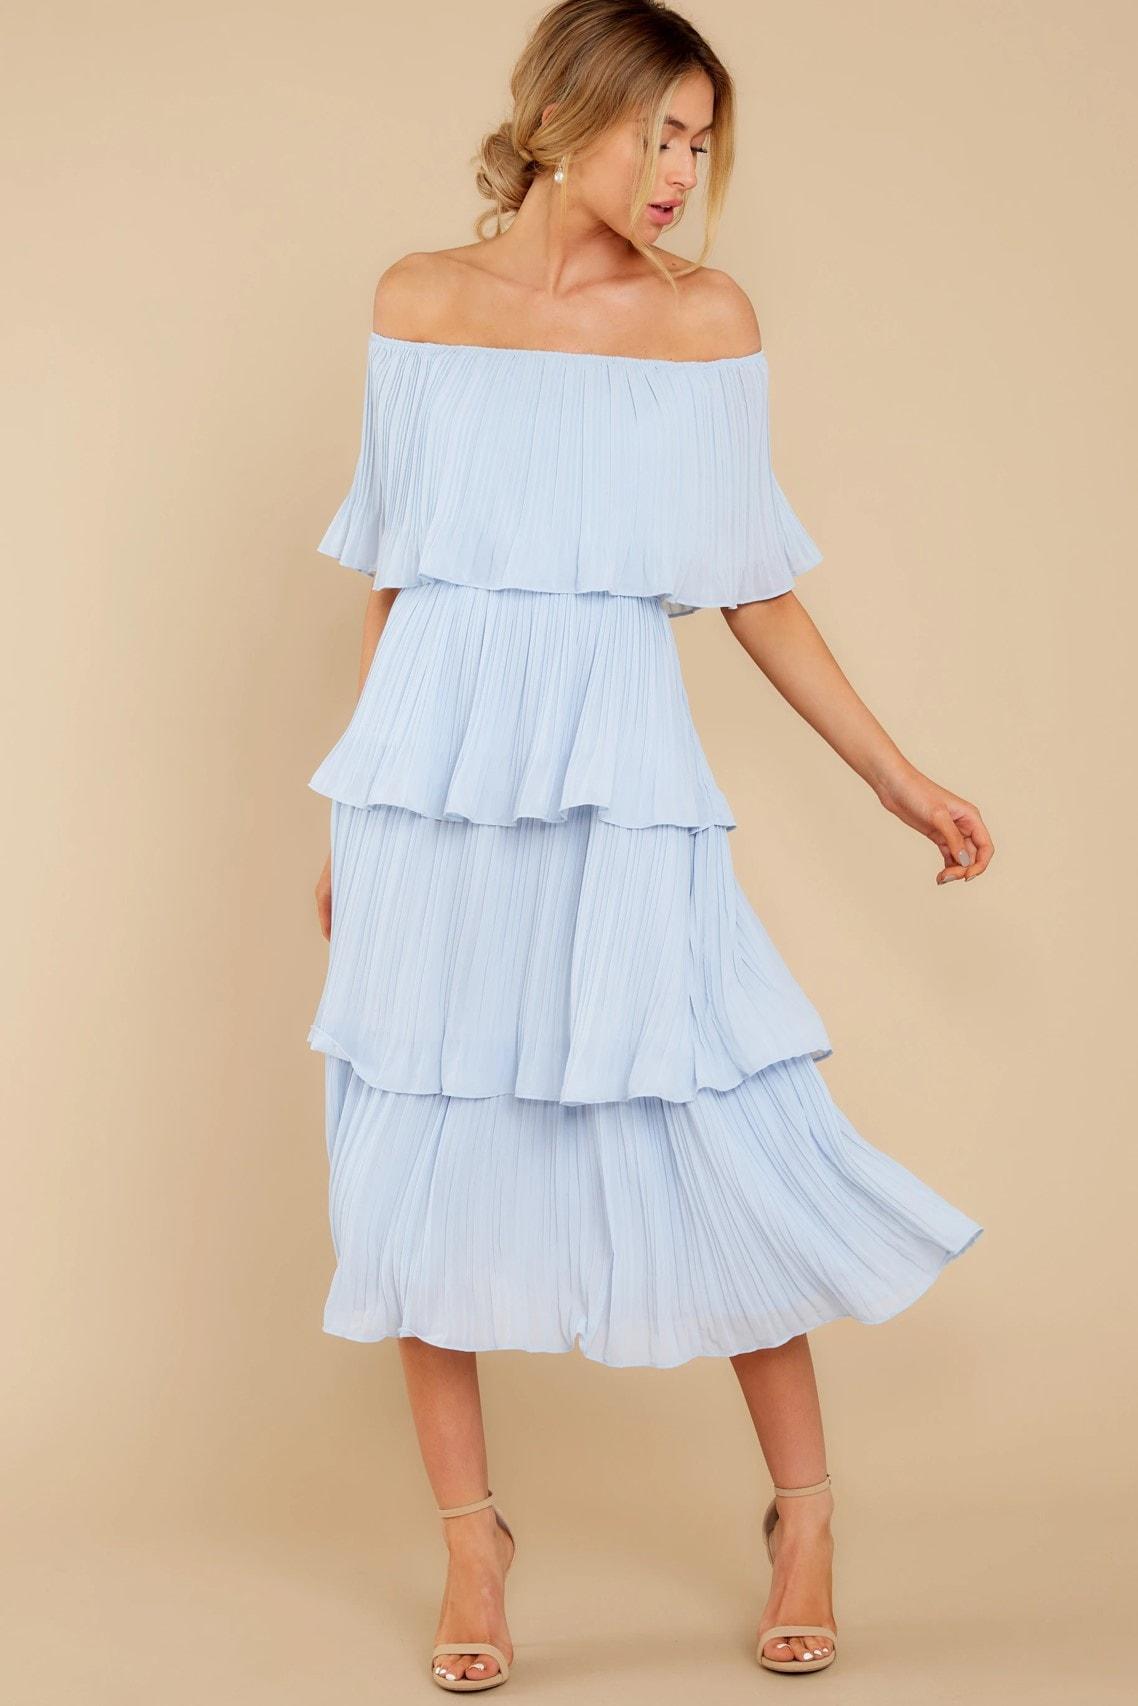 Ruffle Dress For Wedding Guest 59 Off Awi Com,Wedding Beautiful Night Dress